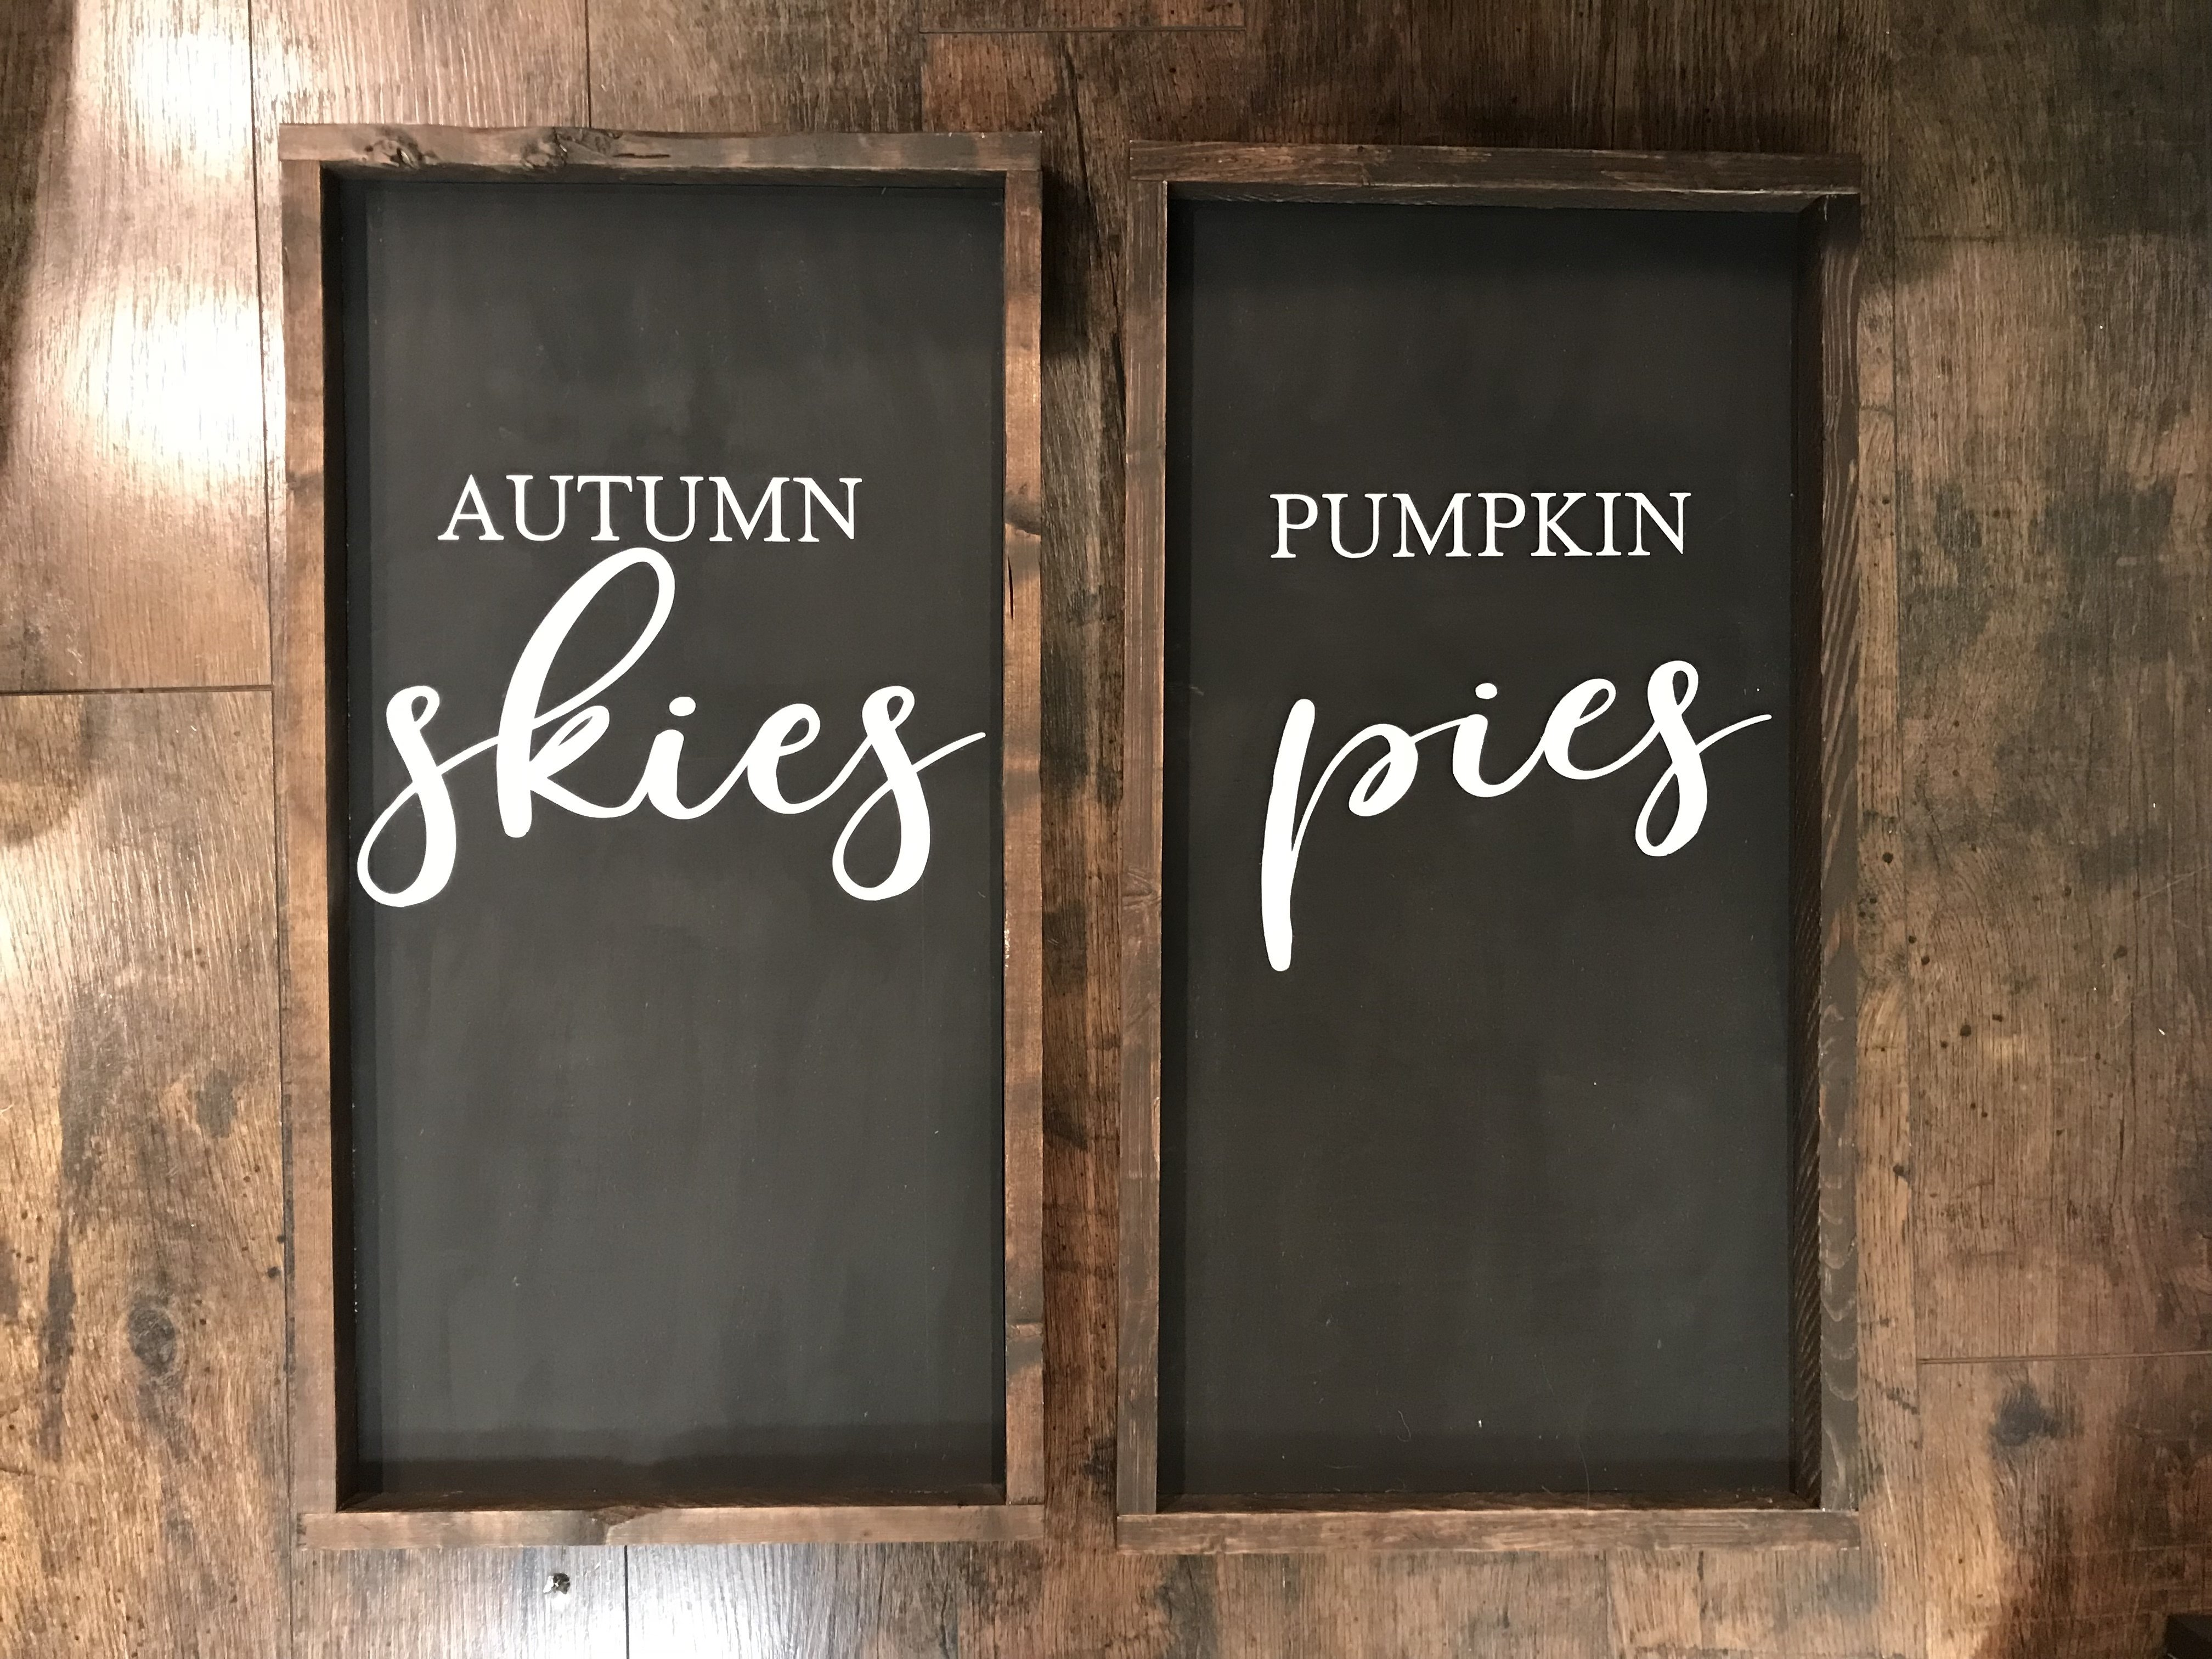 Set of 2 Autumn Skies Pumpkin Pies rcc50